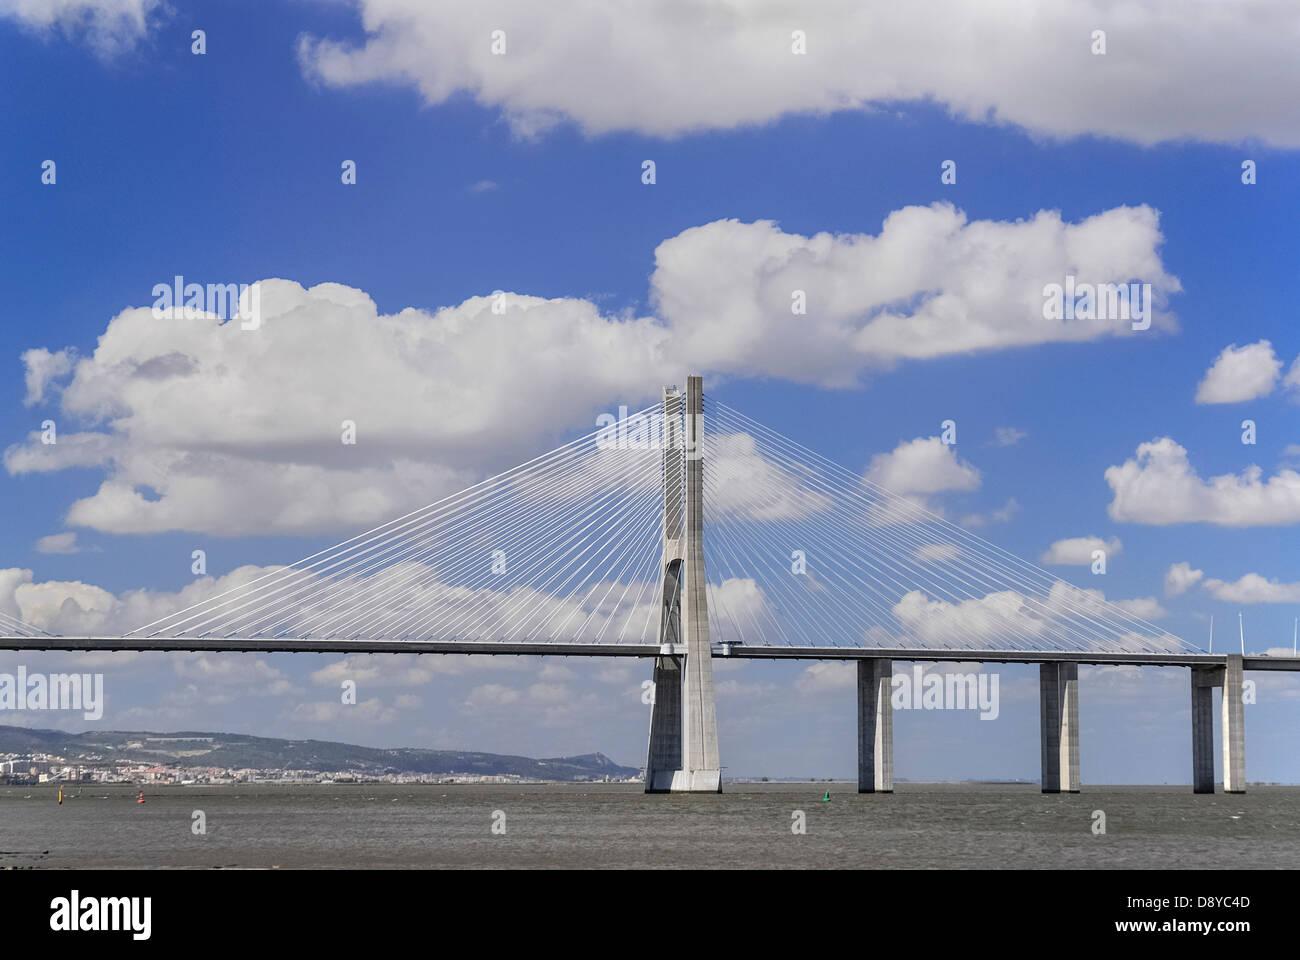 Portugal, Estremadura, Lisbon, Vasco da Gama suspension bridge over the River Tejo or Tagus seen from Parc das Nacoes. - Stock Image